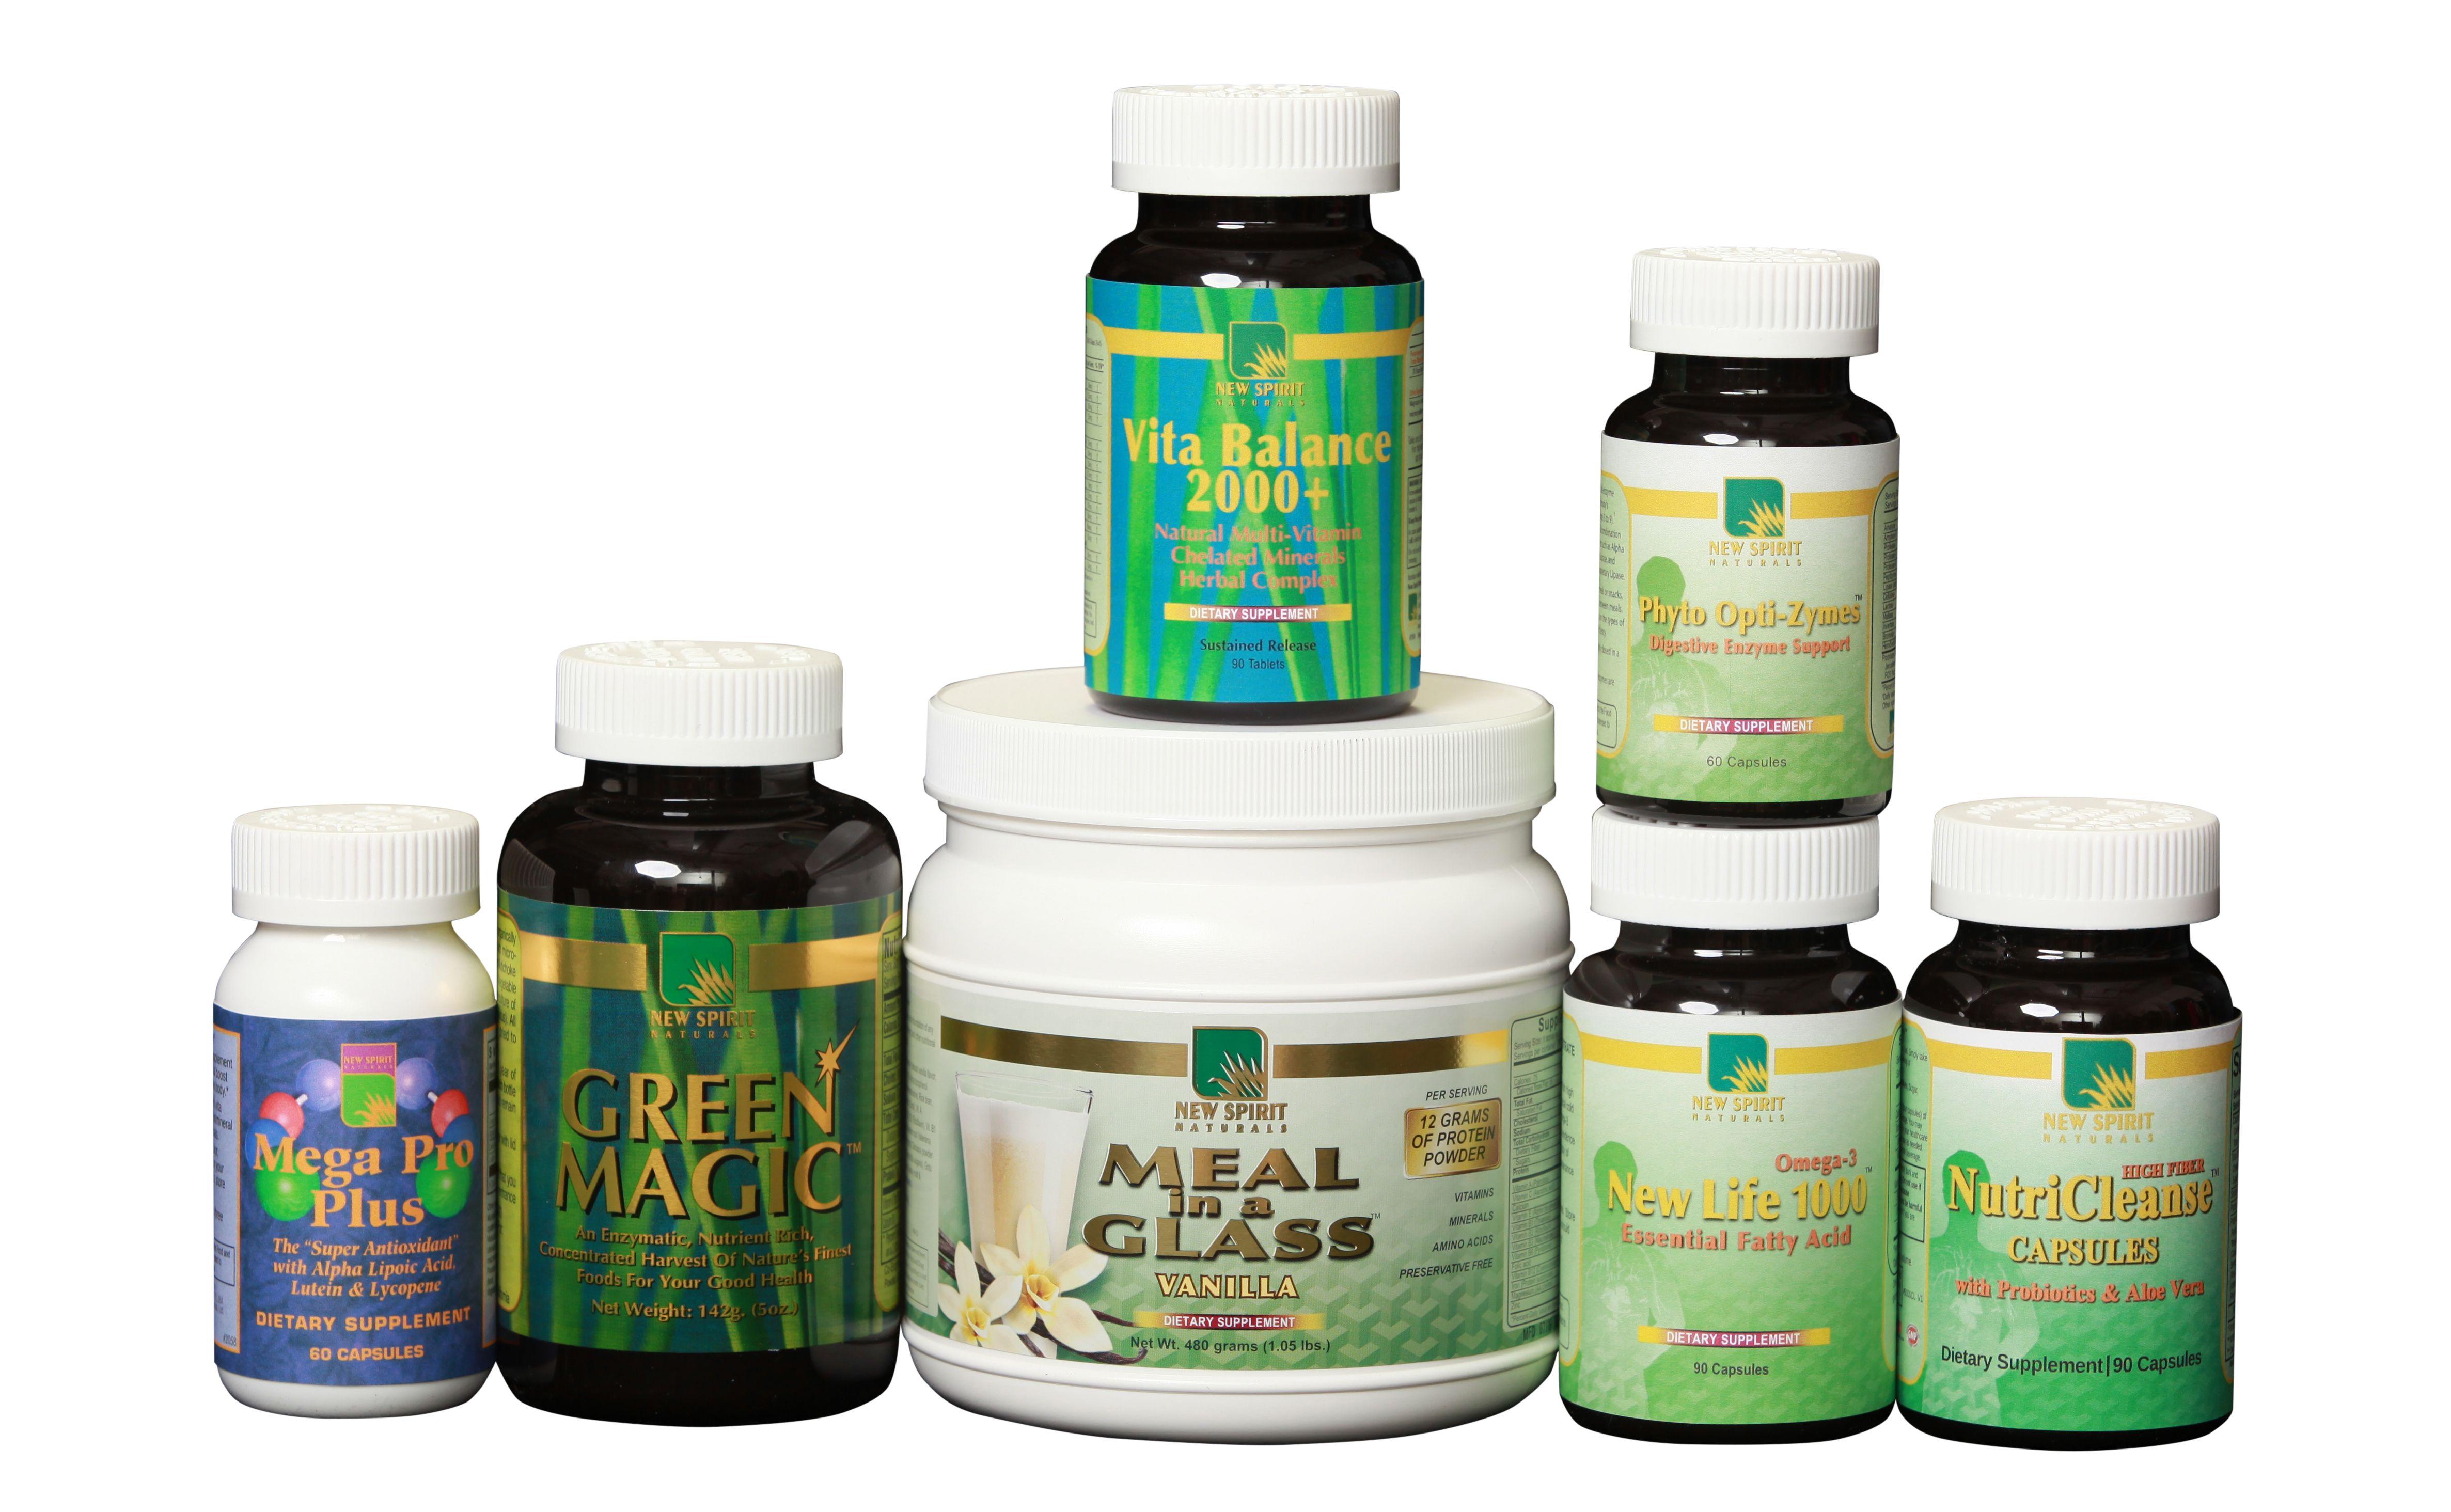 A comprehensive wellness plan for those desiring optimum